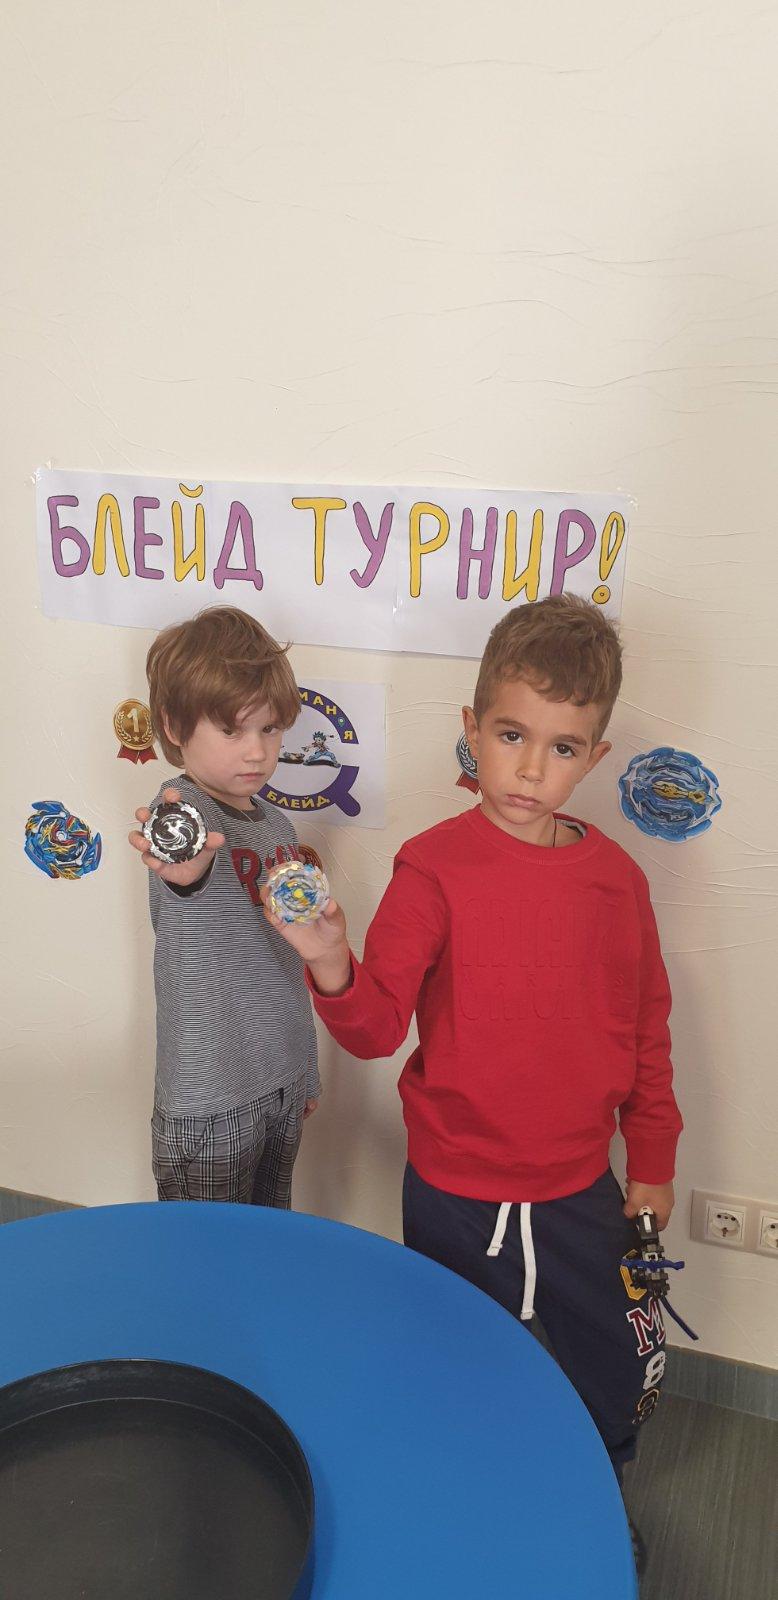 https://akademia-detstva.od.ua/app/uploads/2019/10/4-1.jpg